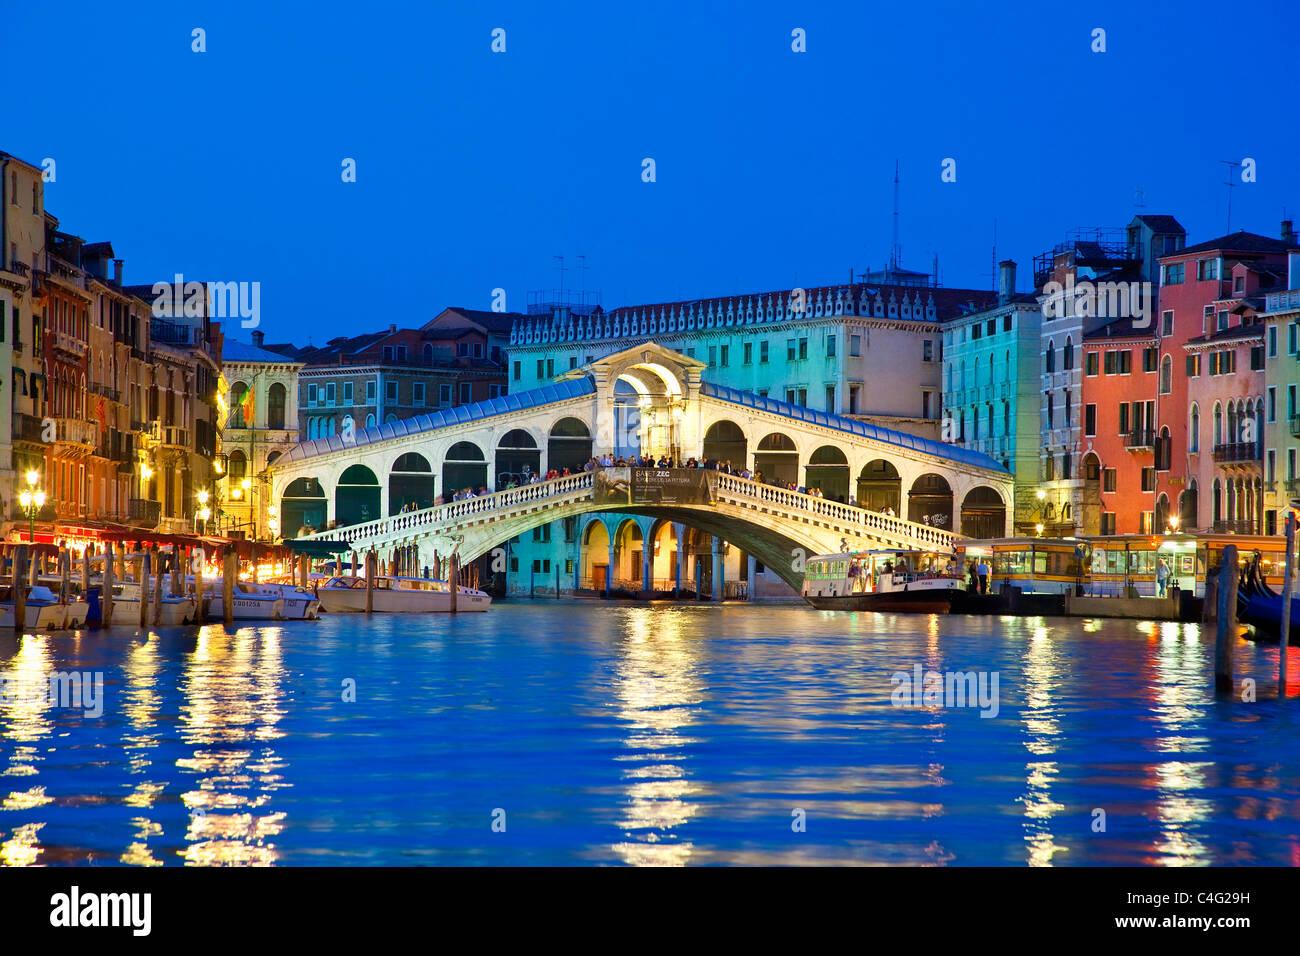 Venice, Rialto Bridge at Night - Stock Image